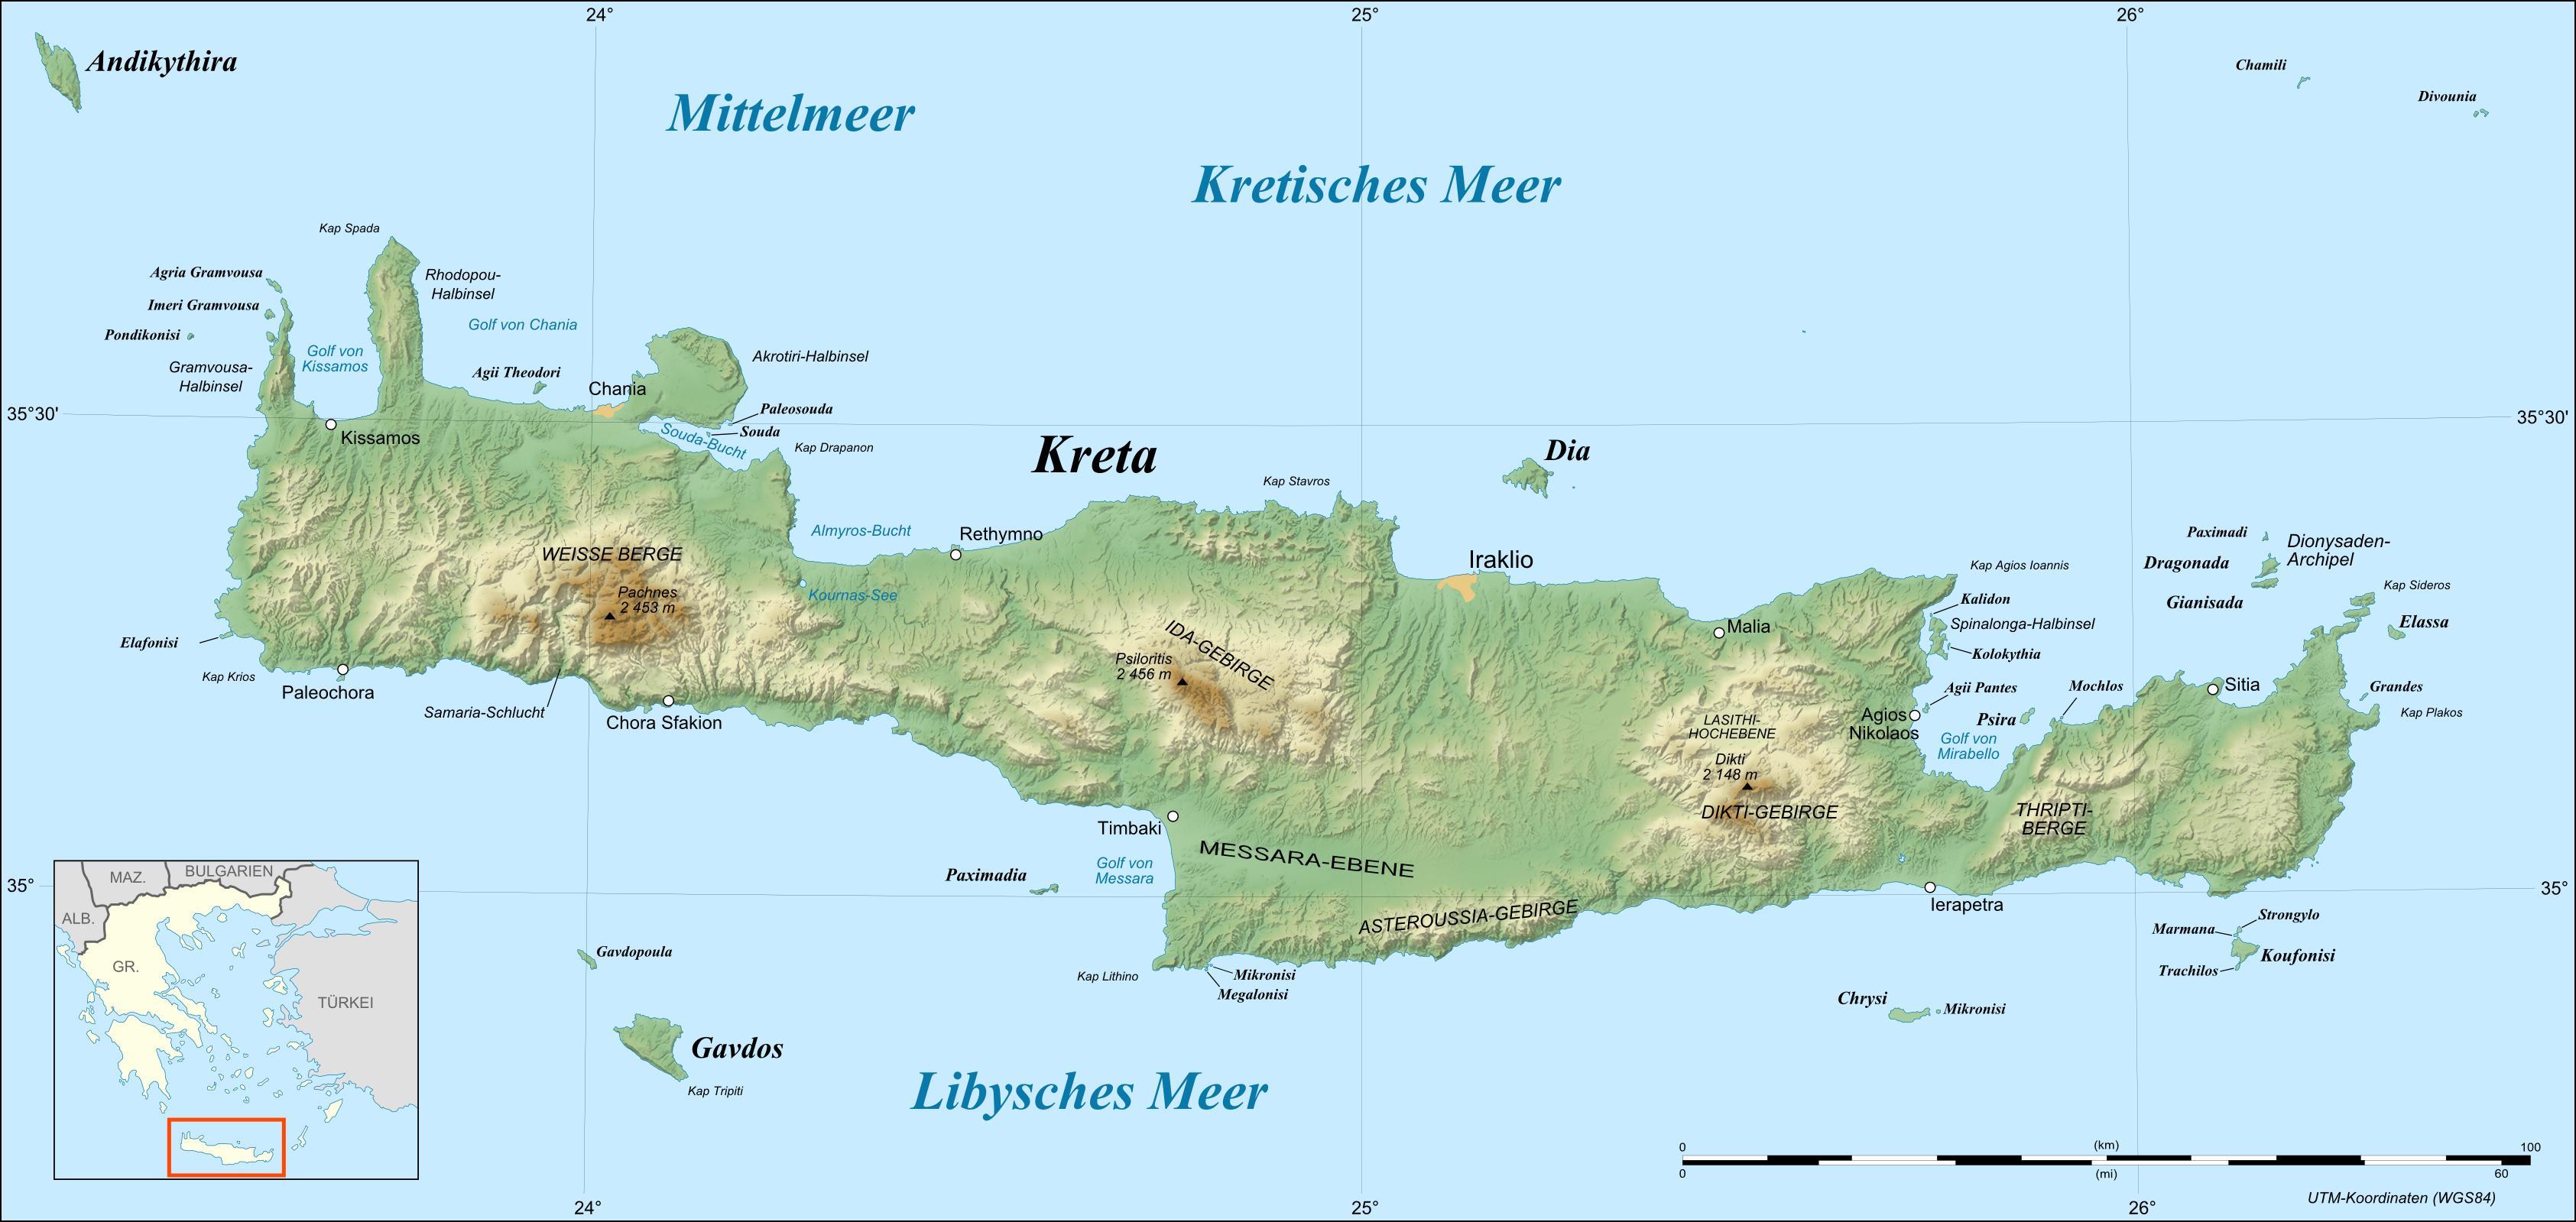 external image Crete_relief_map-de.jpg